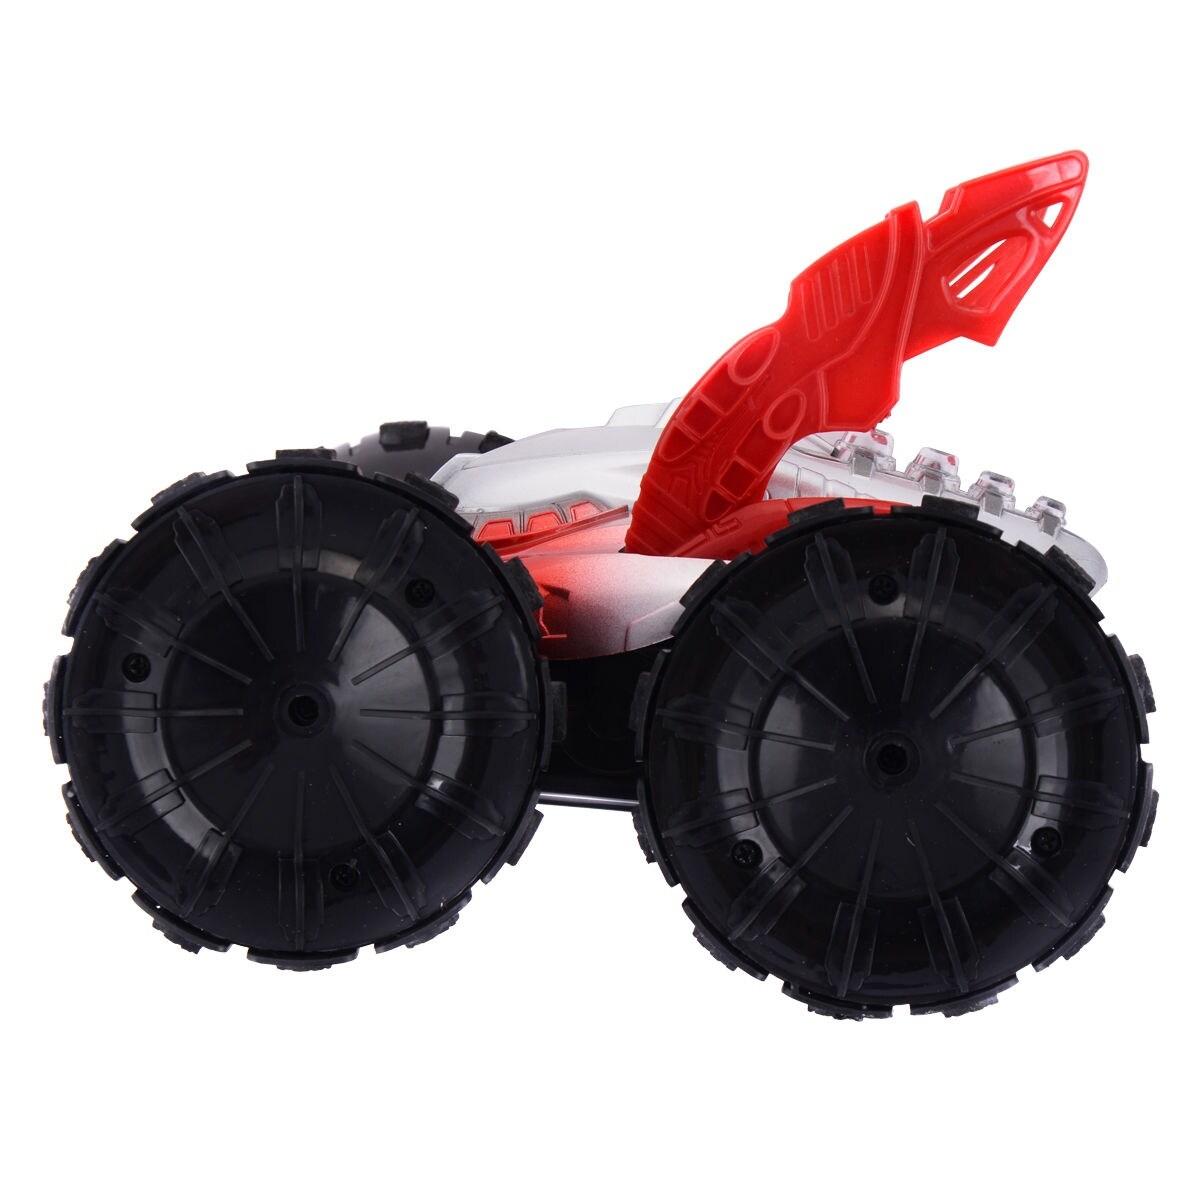 Cars, Trucks & Motorcycles Amphibious RC Car Remote Control Stunt